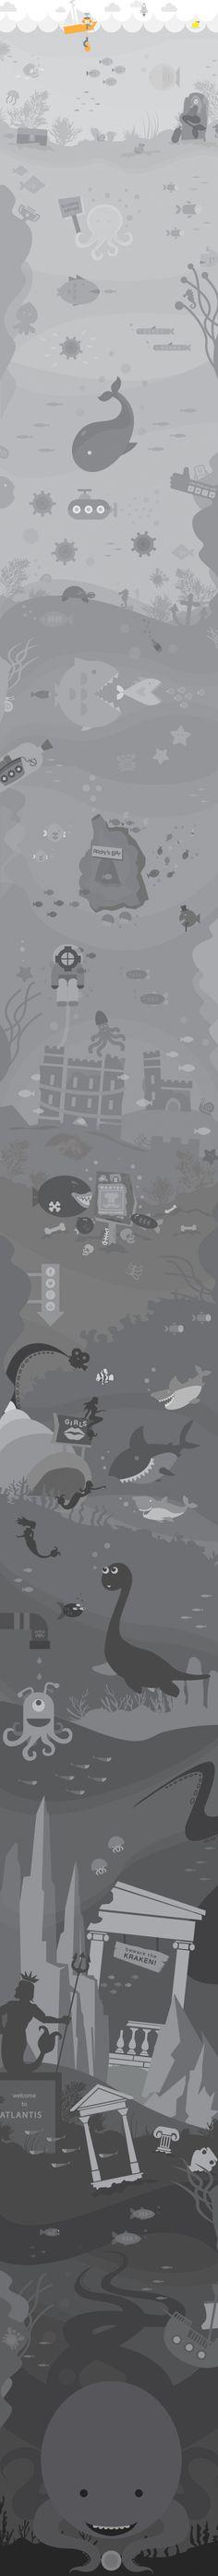 Fishfinger by studiosap , via Behance